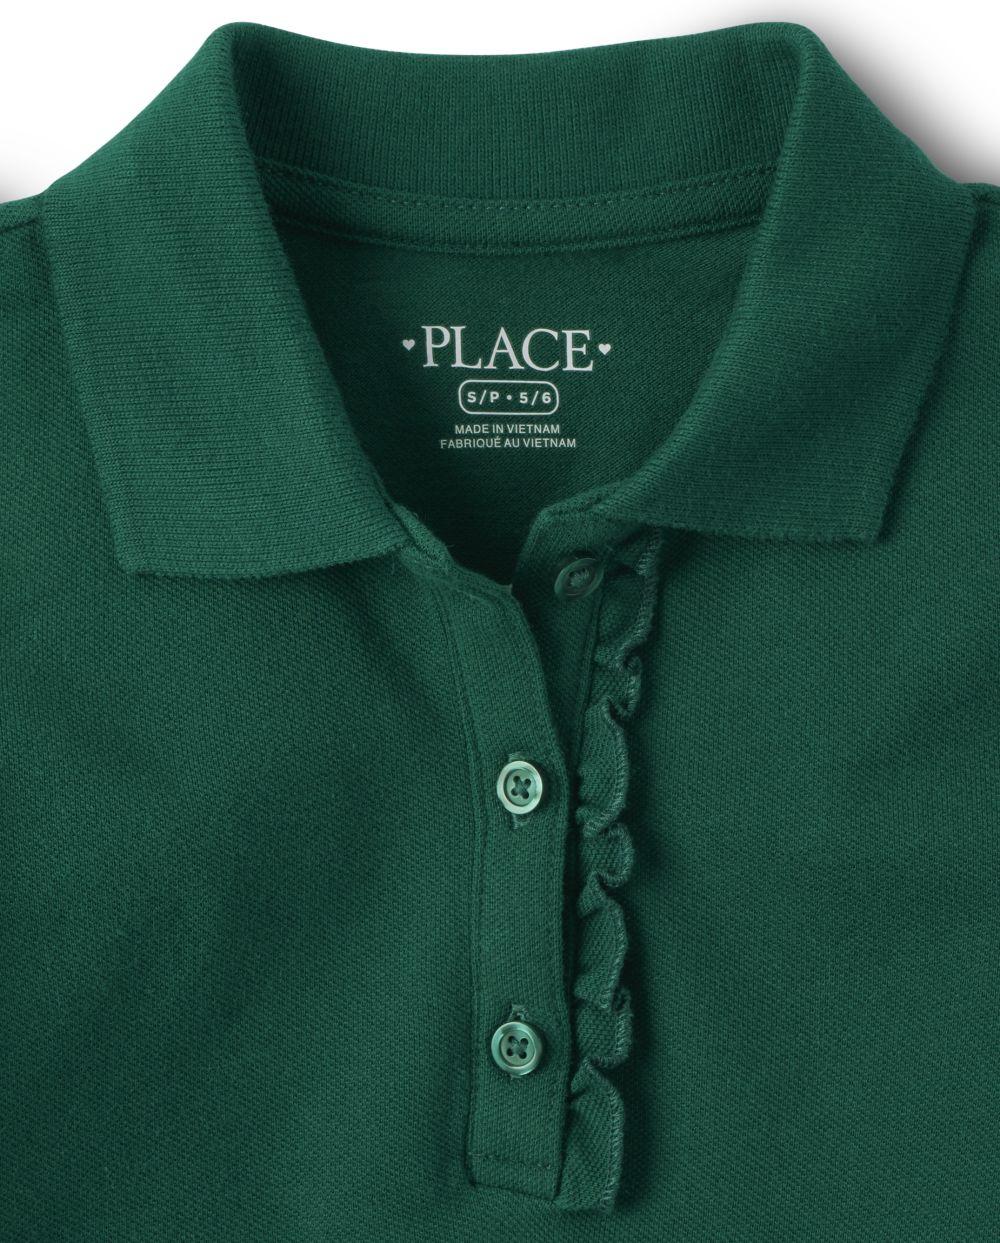 M Ruby 3378 7//8 The Childrens Place Big Girls Uniform Short Sleeve Polo